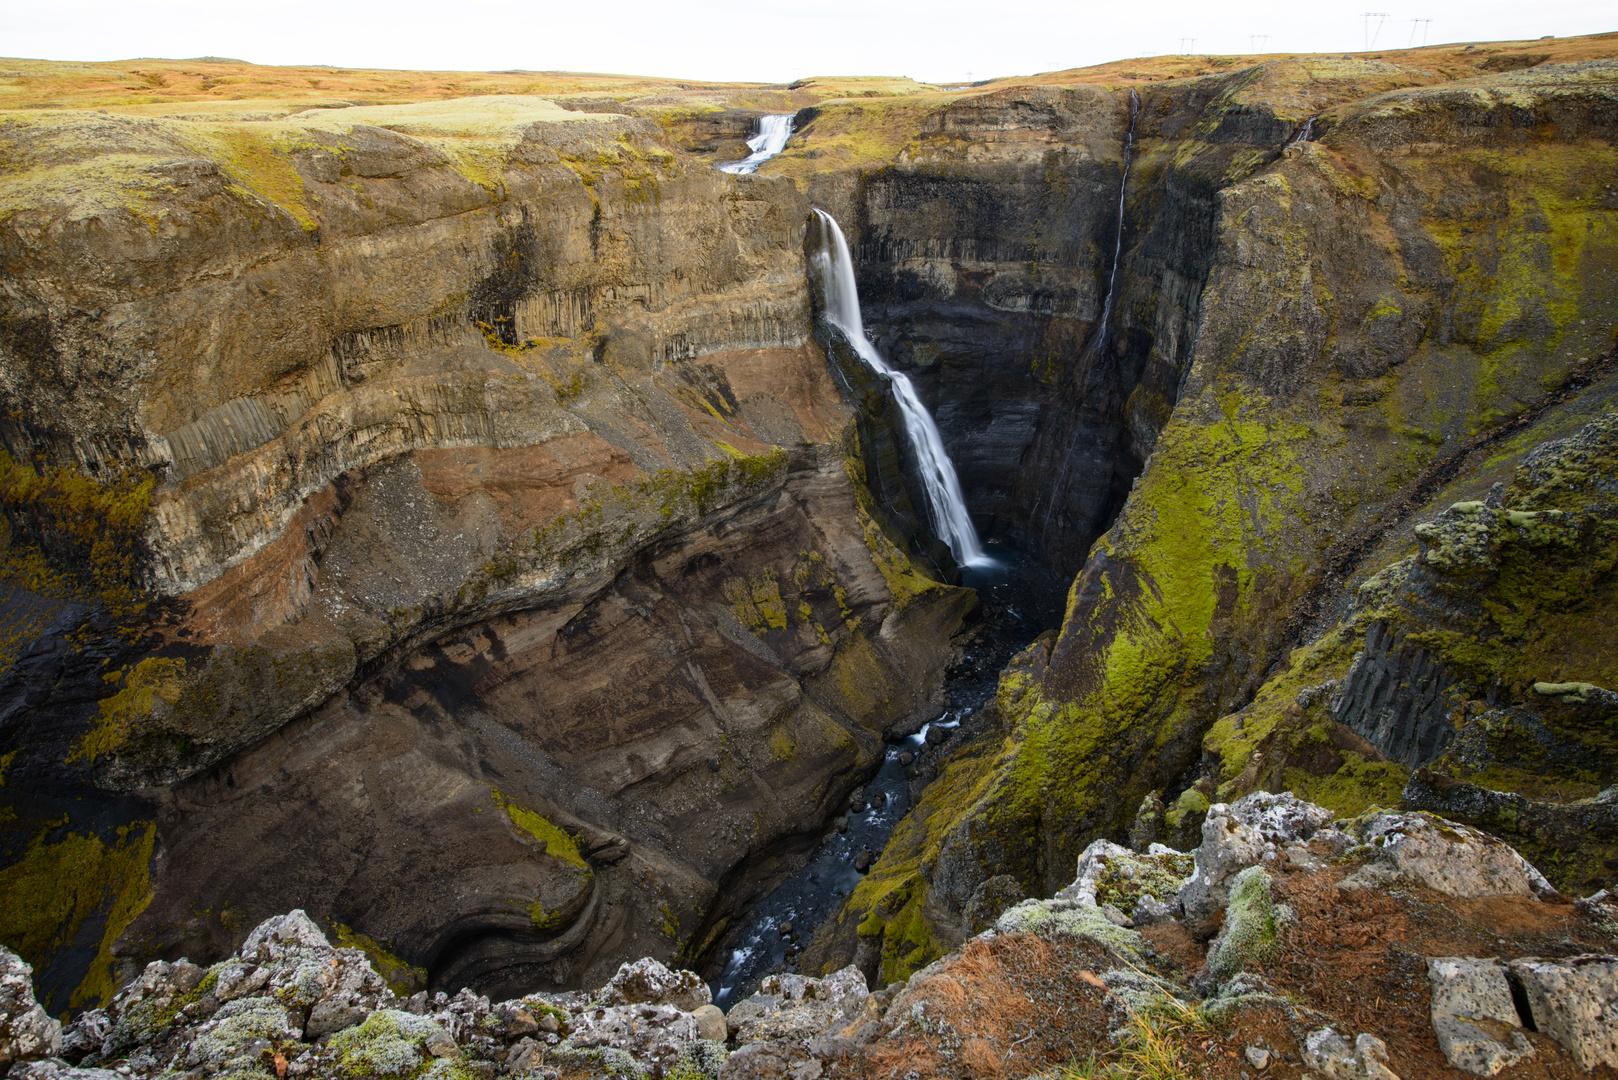 Schlucht des Haifoss Wasserfalls